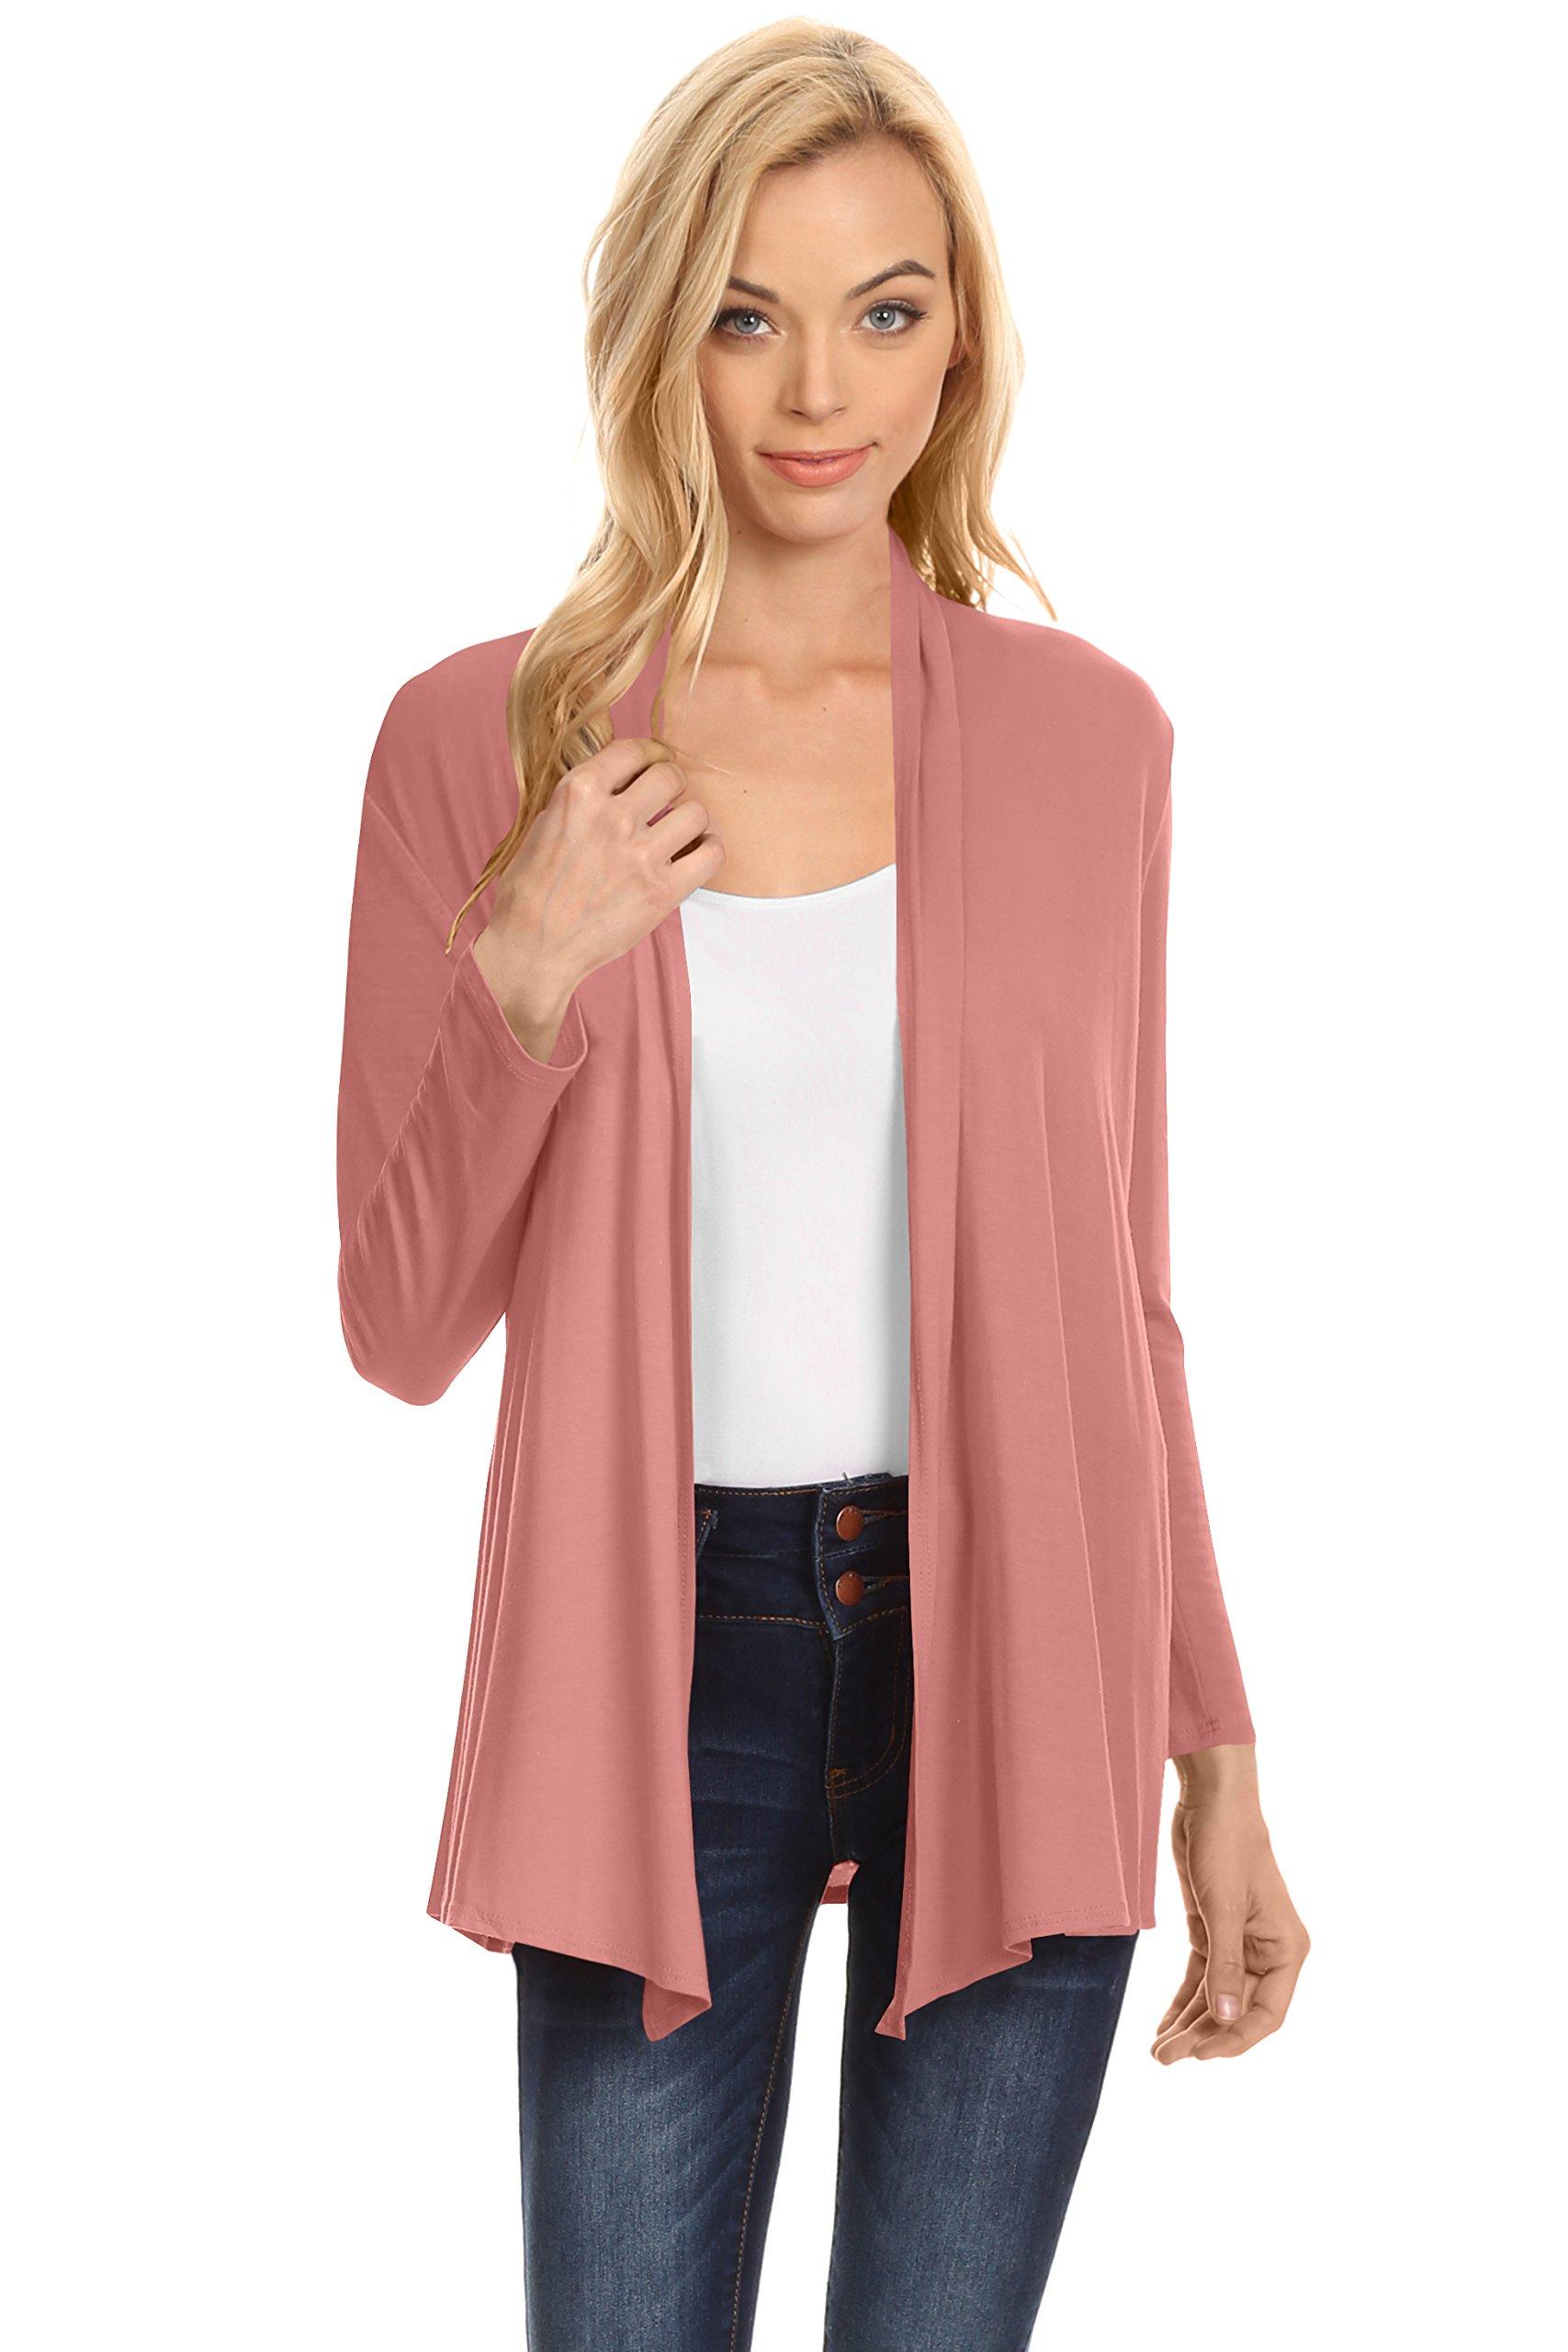 Simlu Womens Open Drape Cardigan Reg and Plus Size Cardigan Sweater Long Sleeves - USA Rose Small